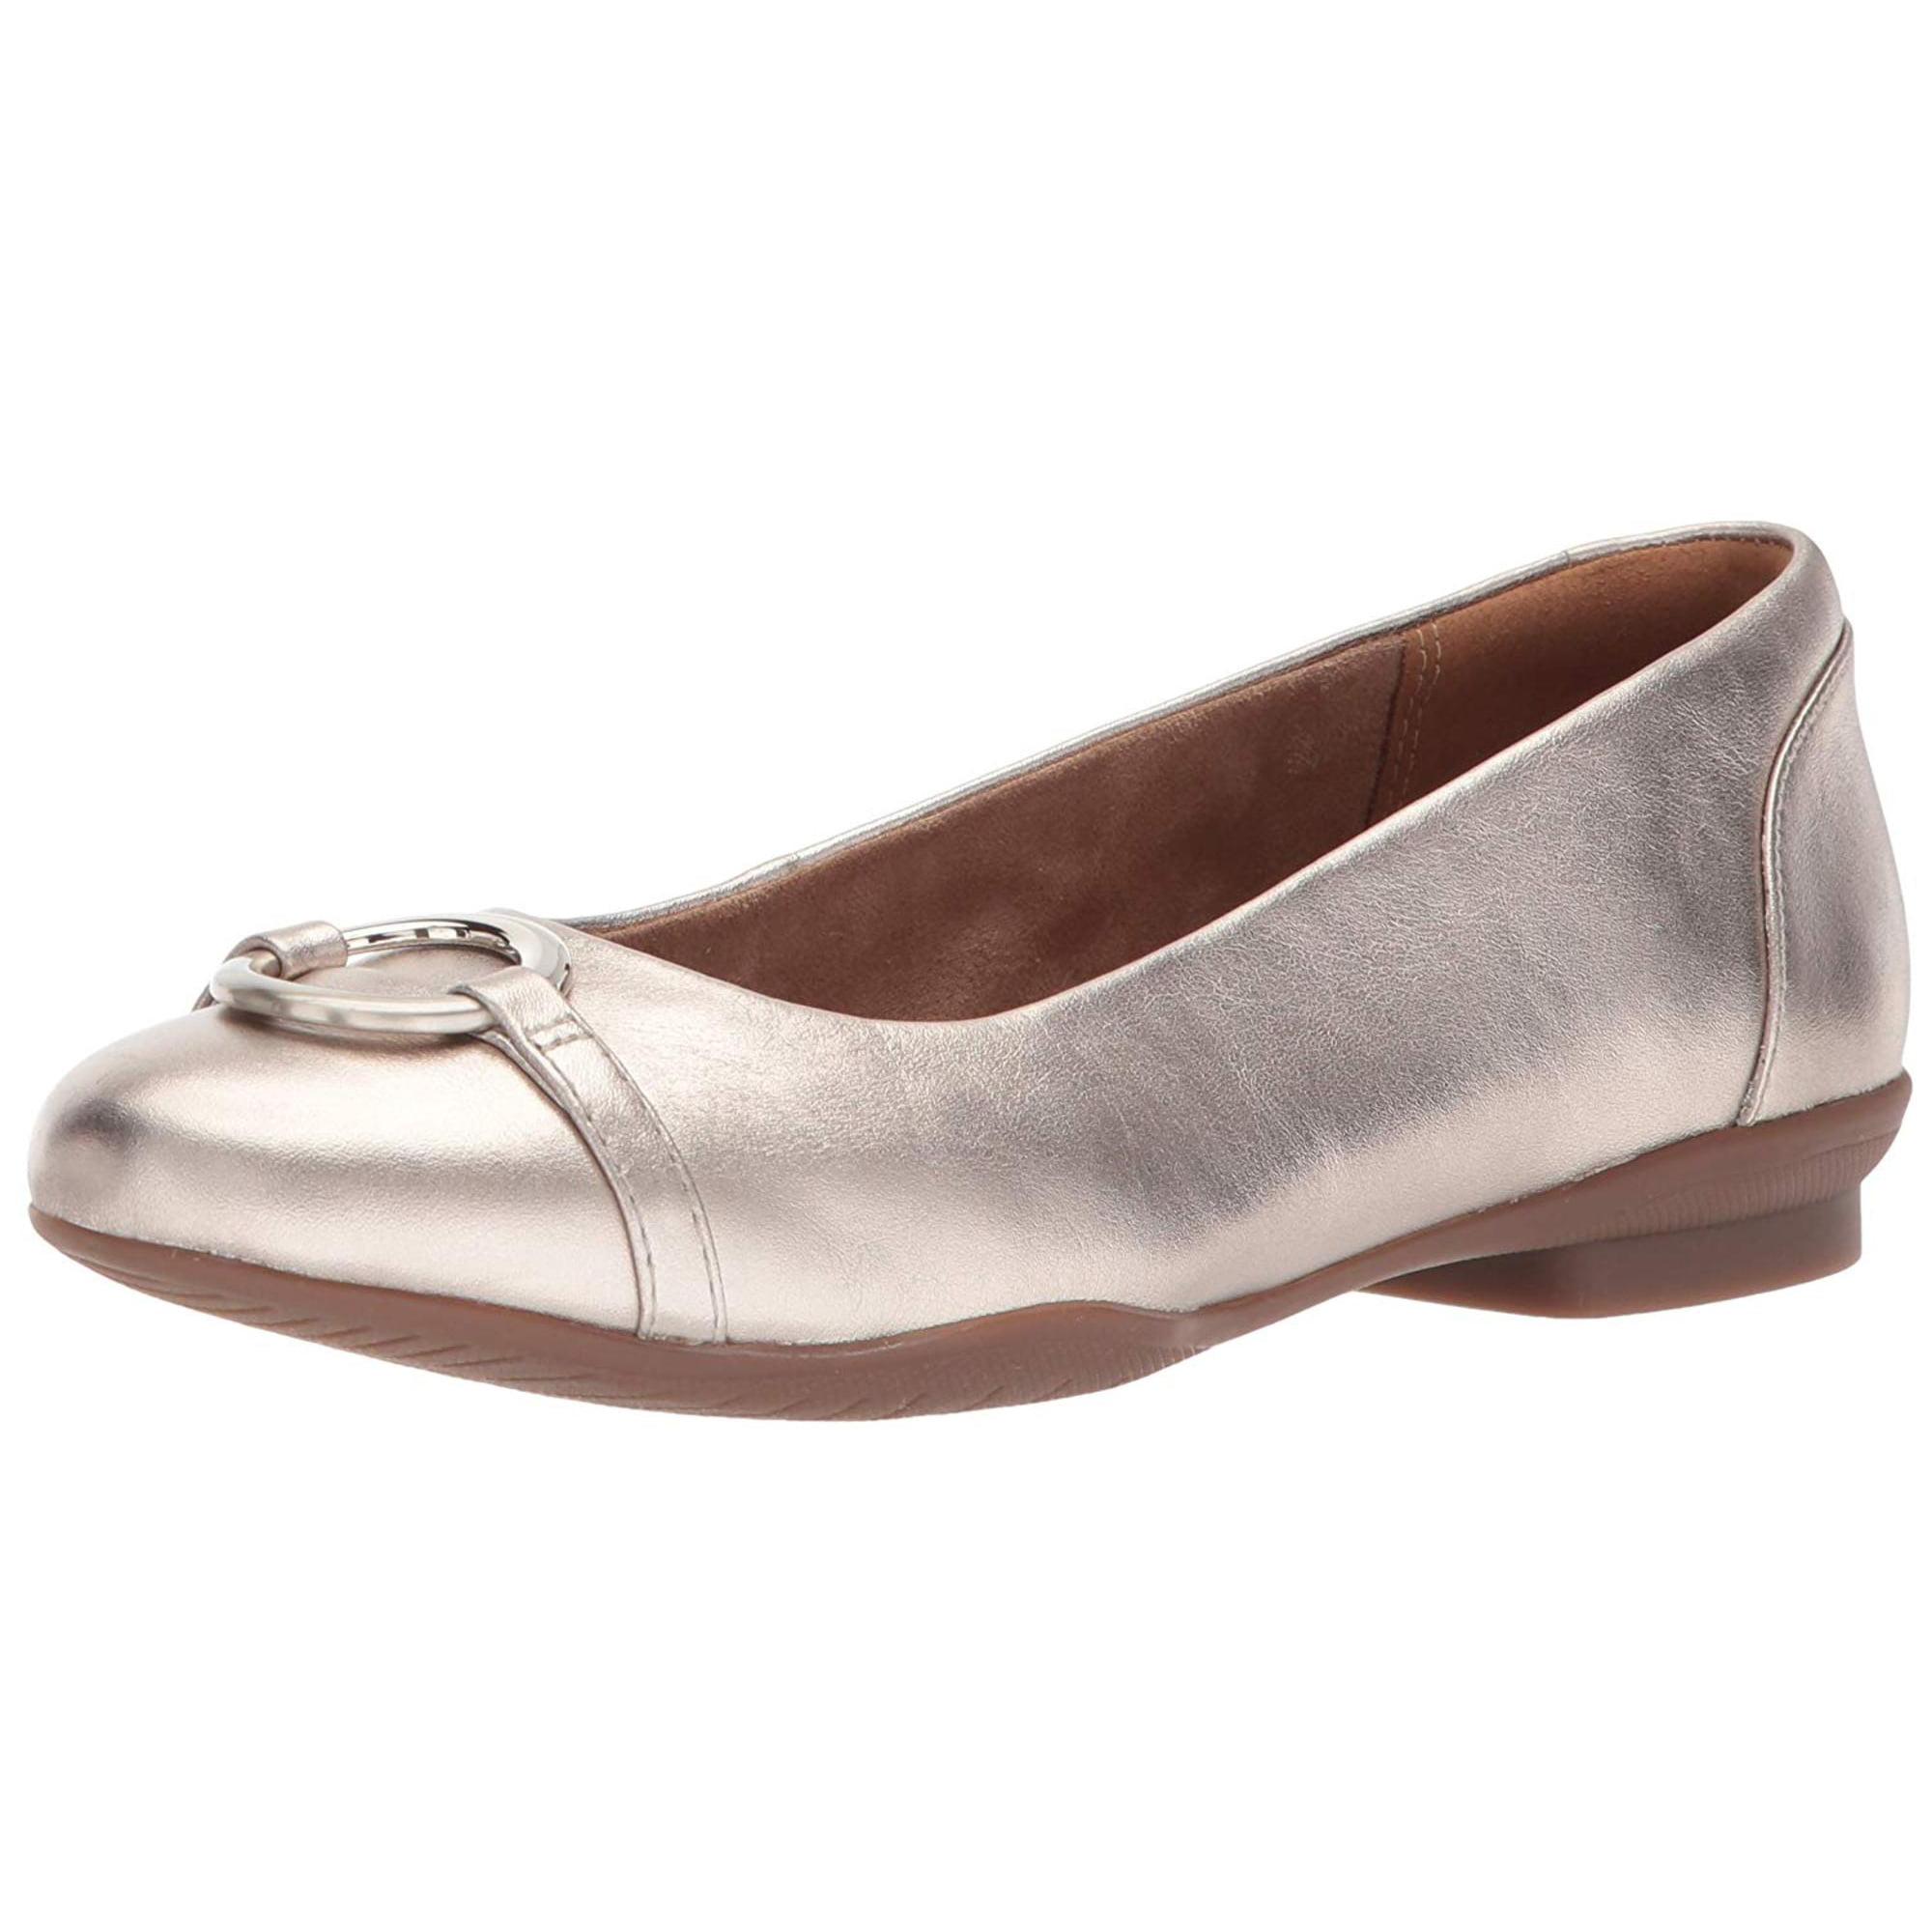 419c9b5f569a3 CLARKS Women's Neenah Vine Ballet Flat | Walmart Canada